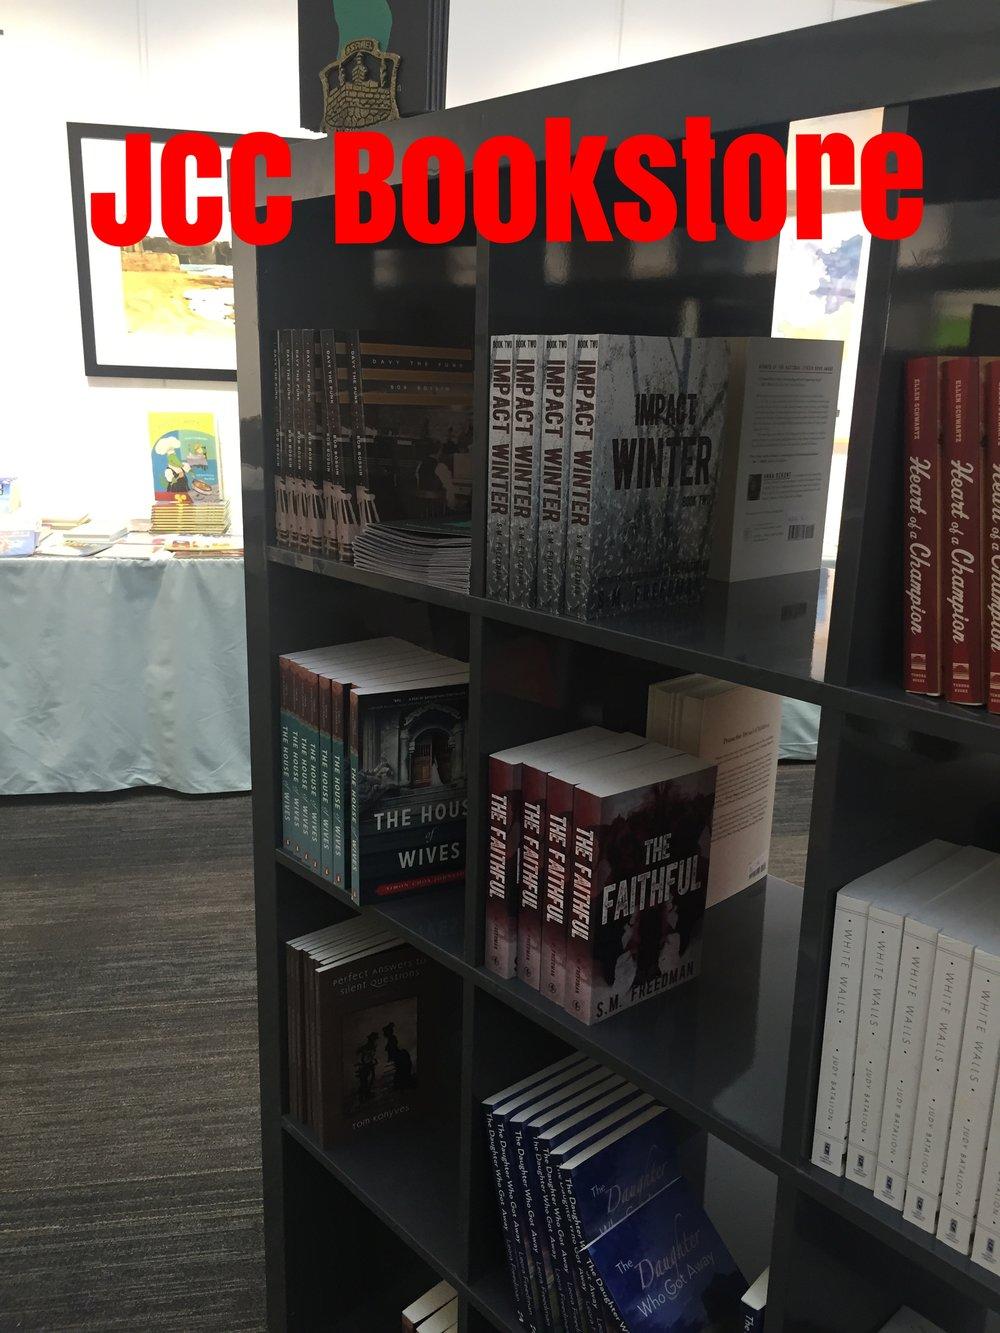 JCC Bookstore